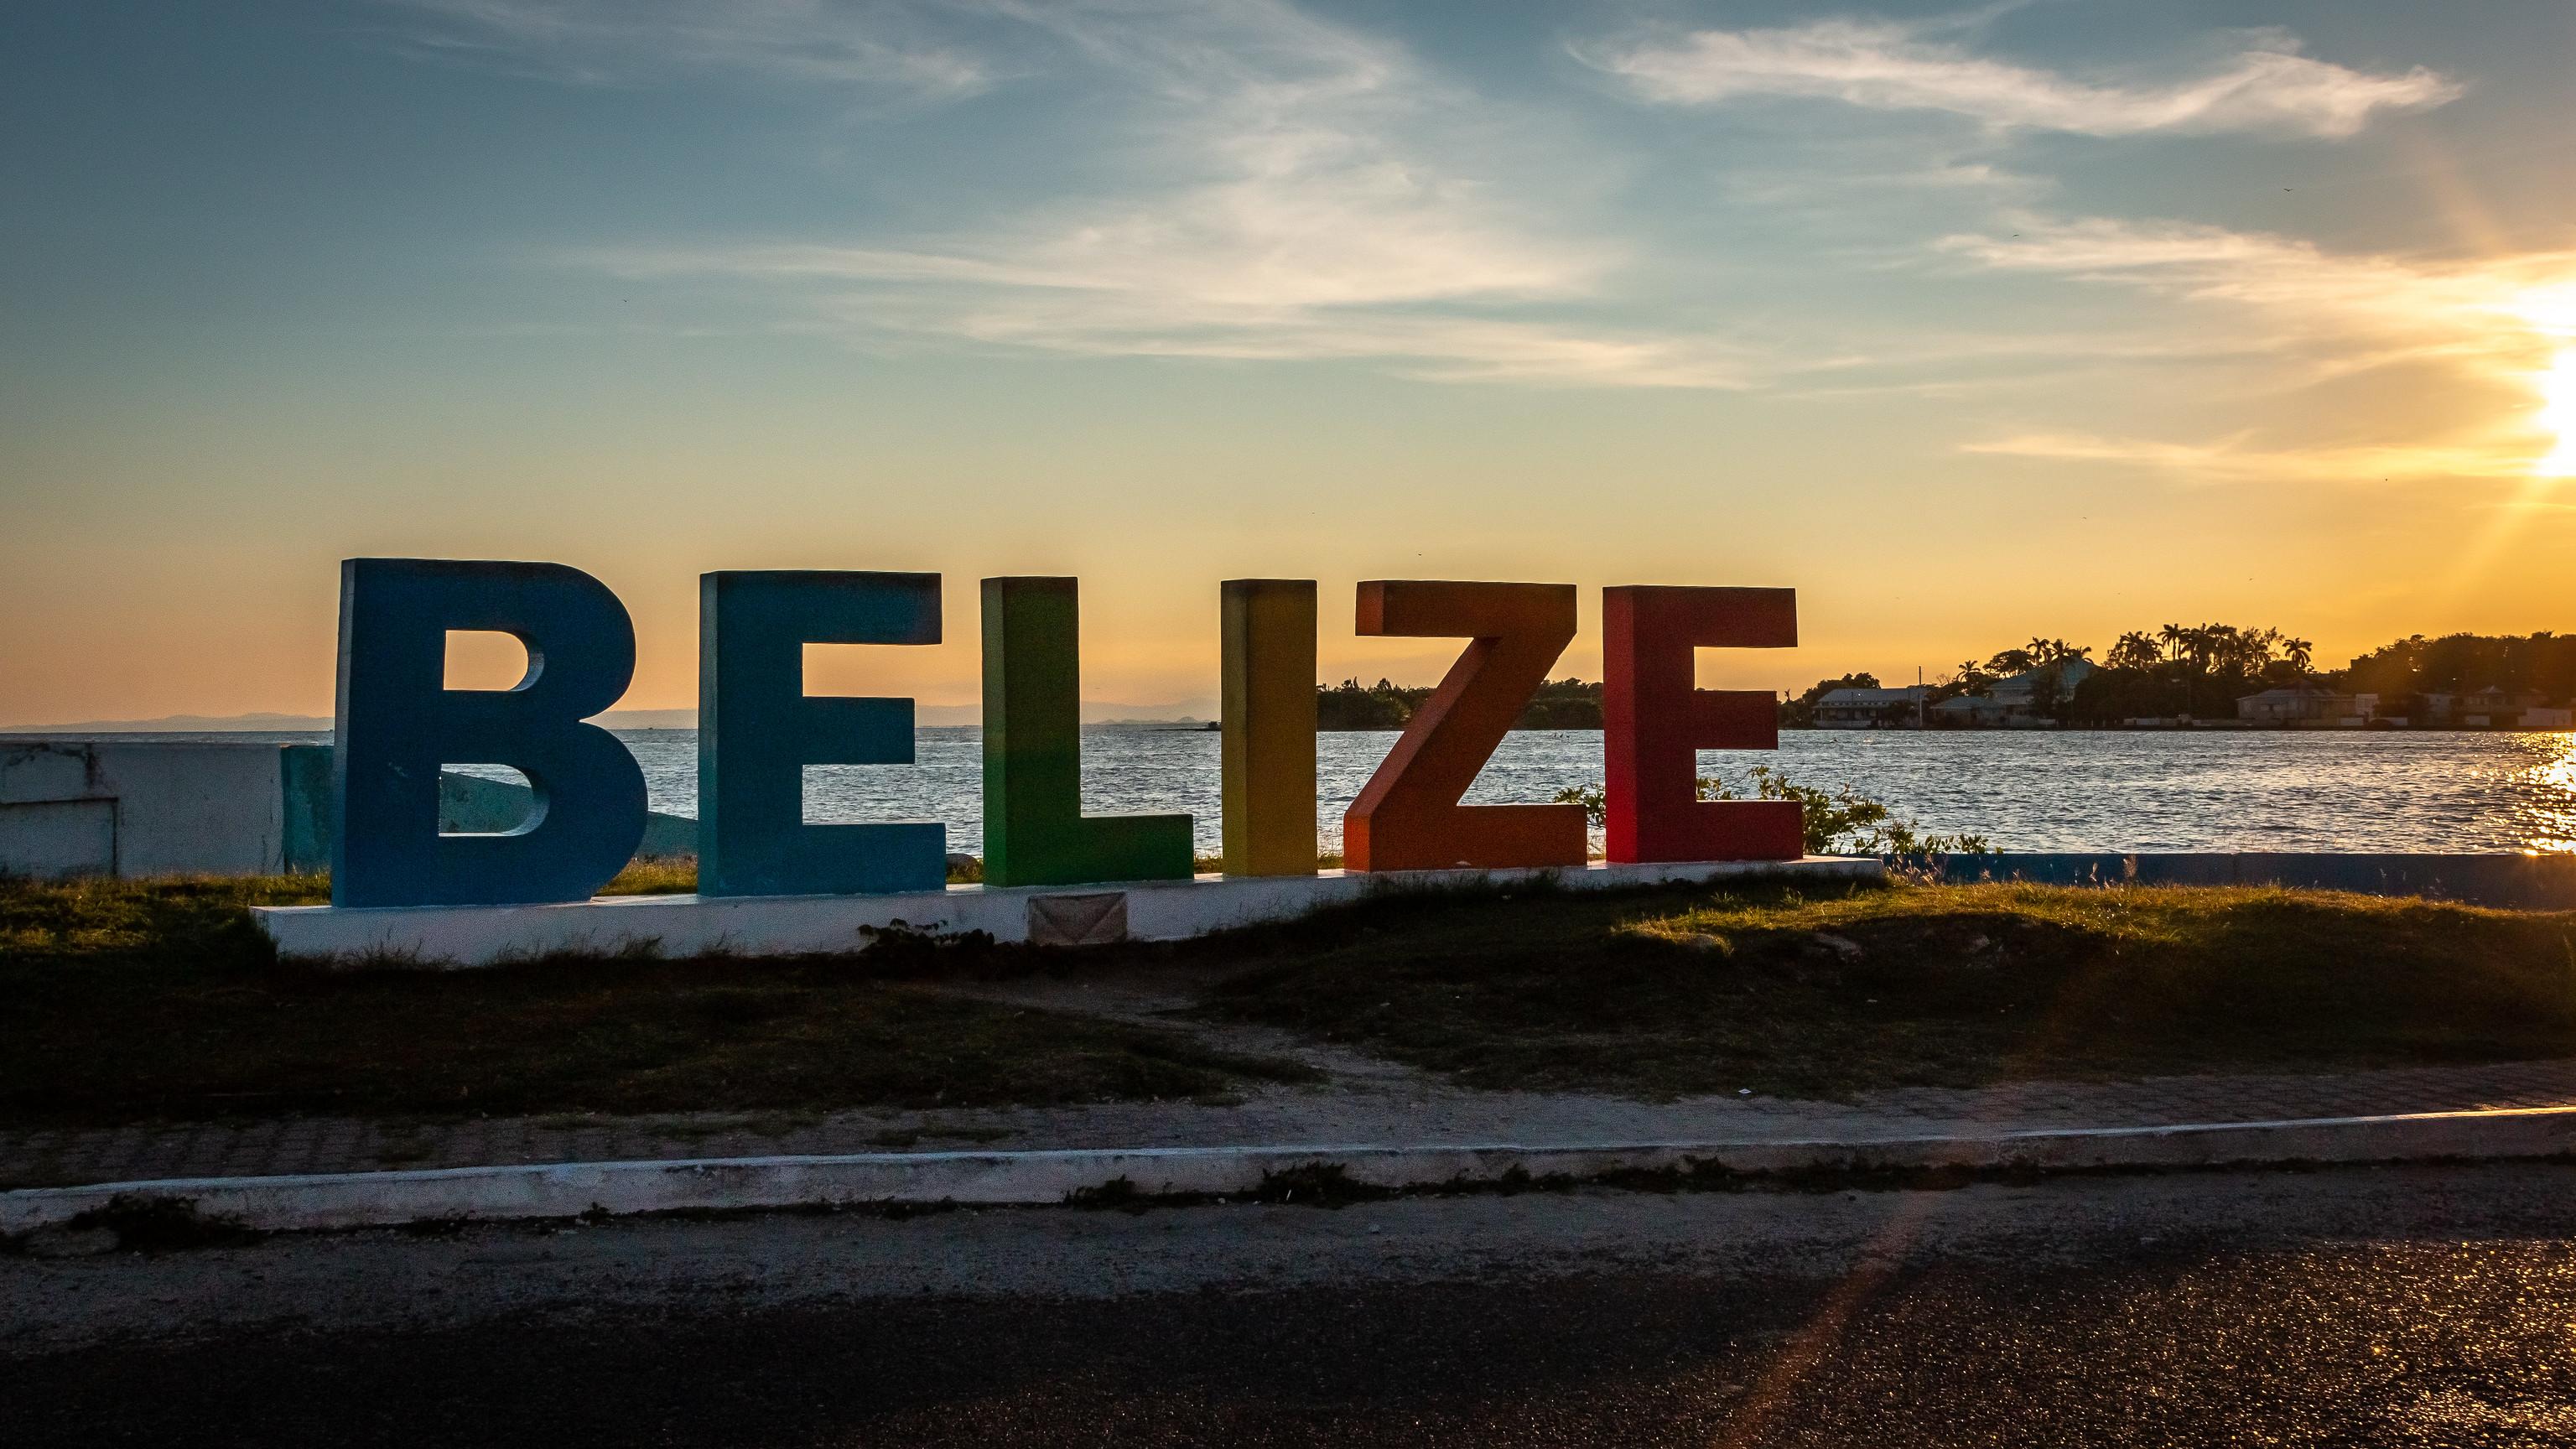 Belize City - [Belize]